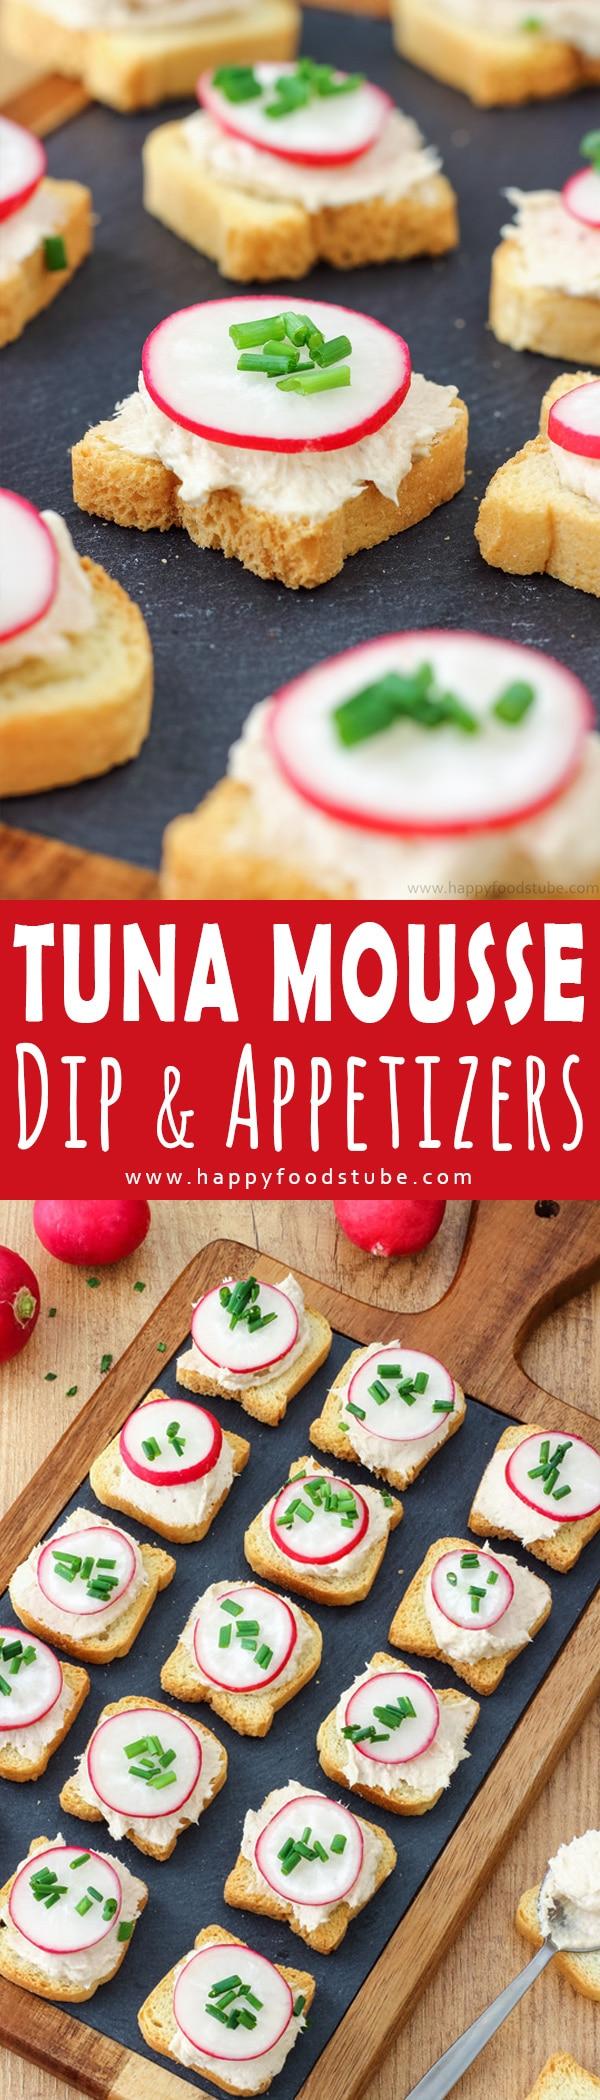 how to make tuna salad dip